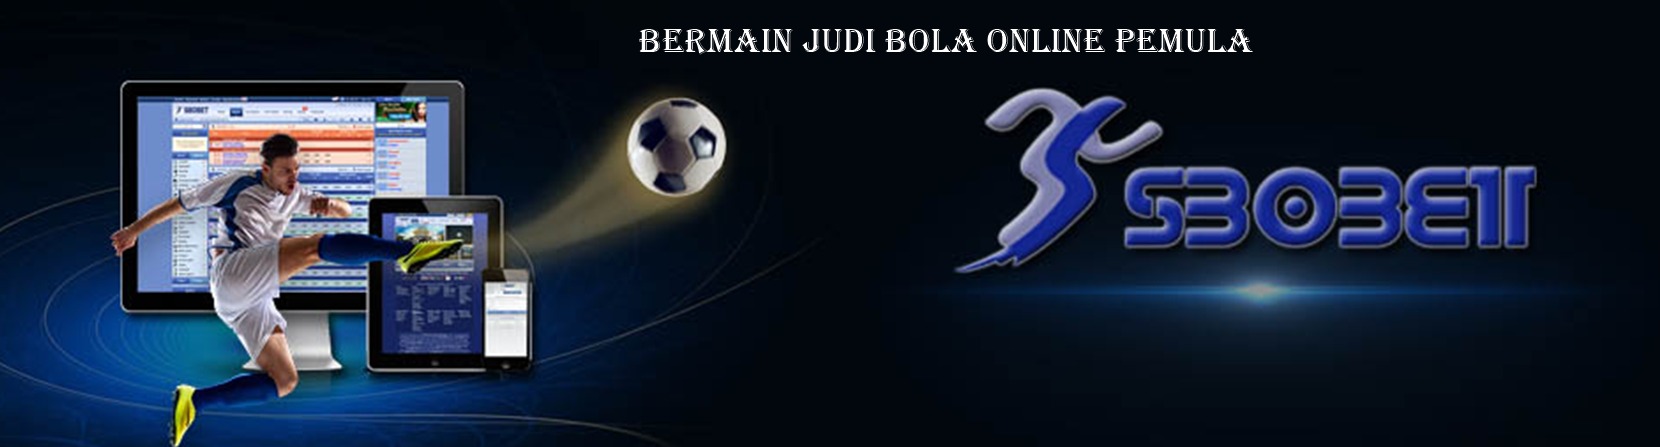 Bermain Judi Bola Online Pemula